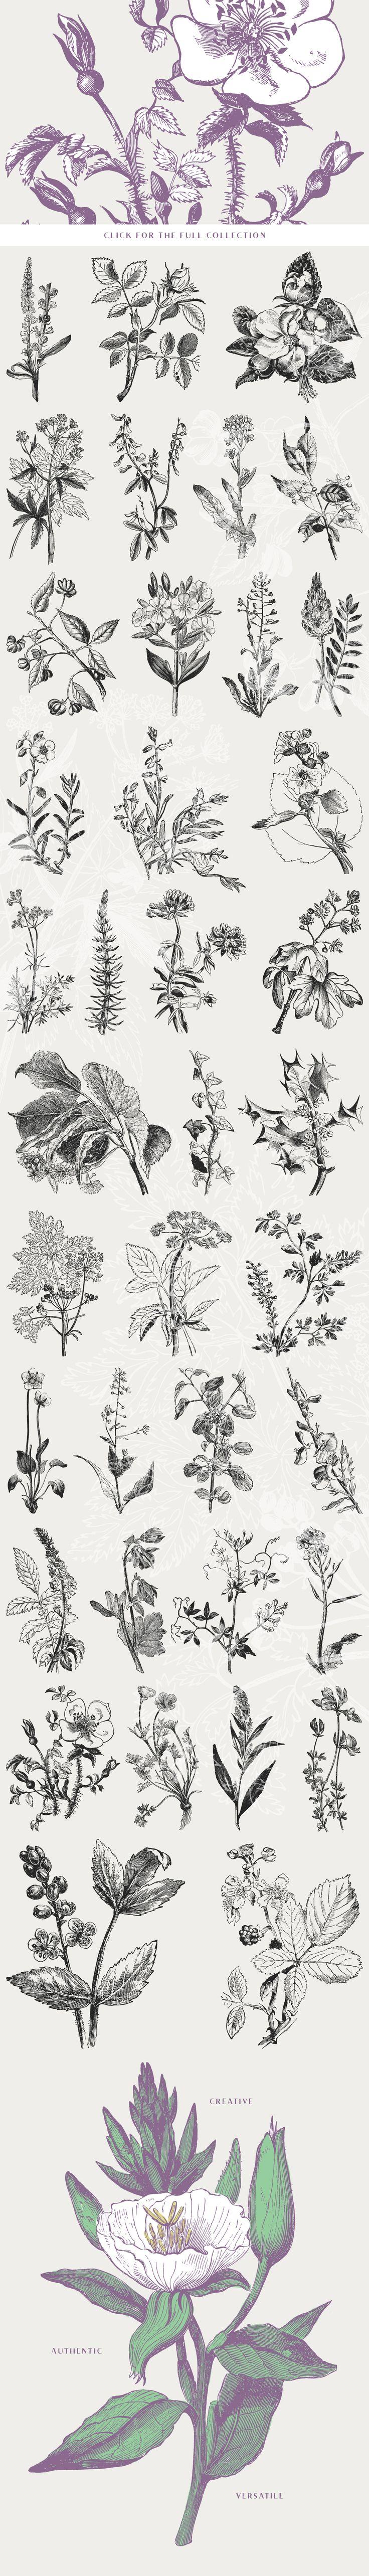 39 Plant & Flower Illustration Vol.3 by Vector Hut on @creativemarket